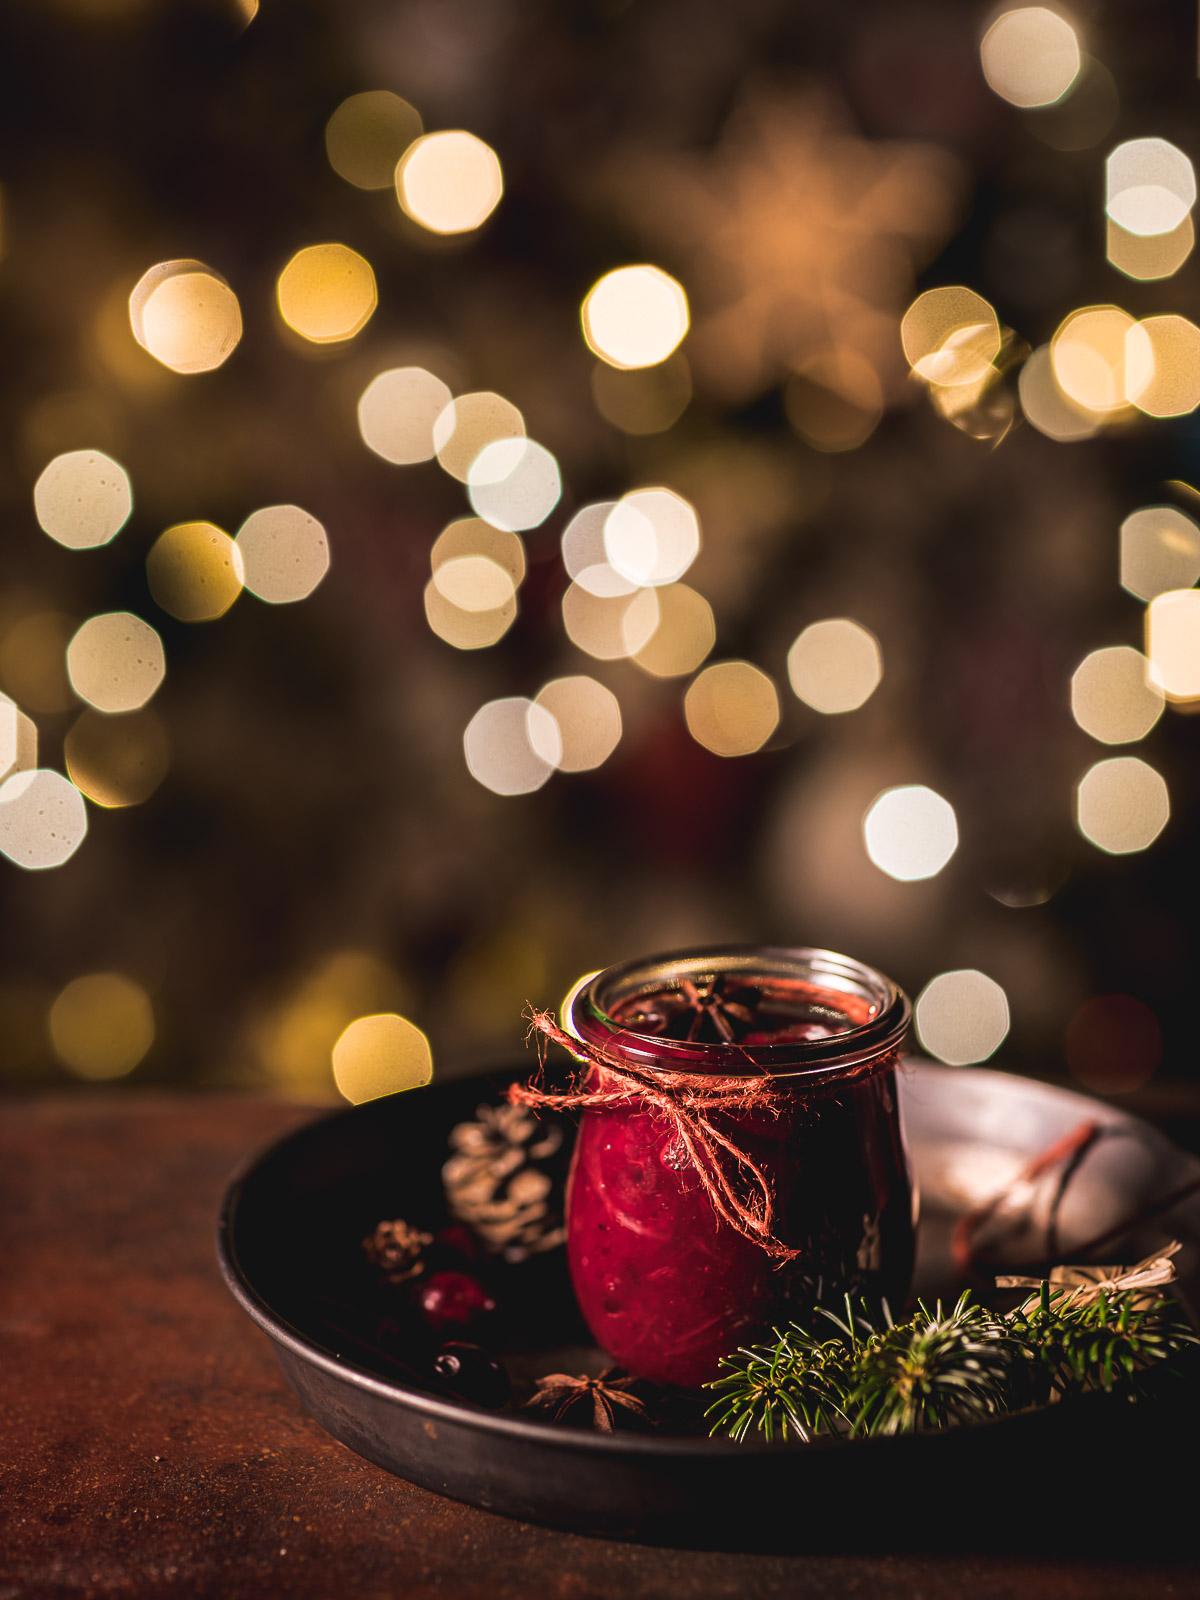 vegan Maple Cranberry Sauce recipe naturally sweetened with maple syrup ricetta salsa di mirtilli rossi per Natale idea regalo salsa cranberry Thanksgiving